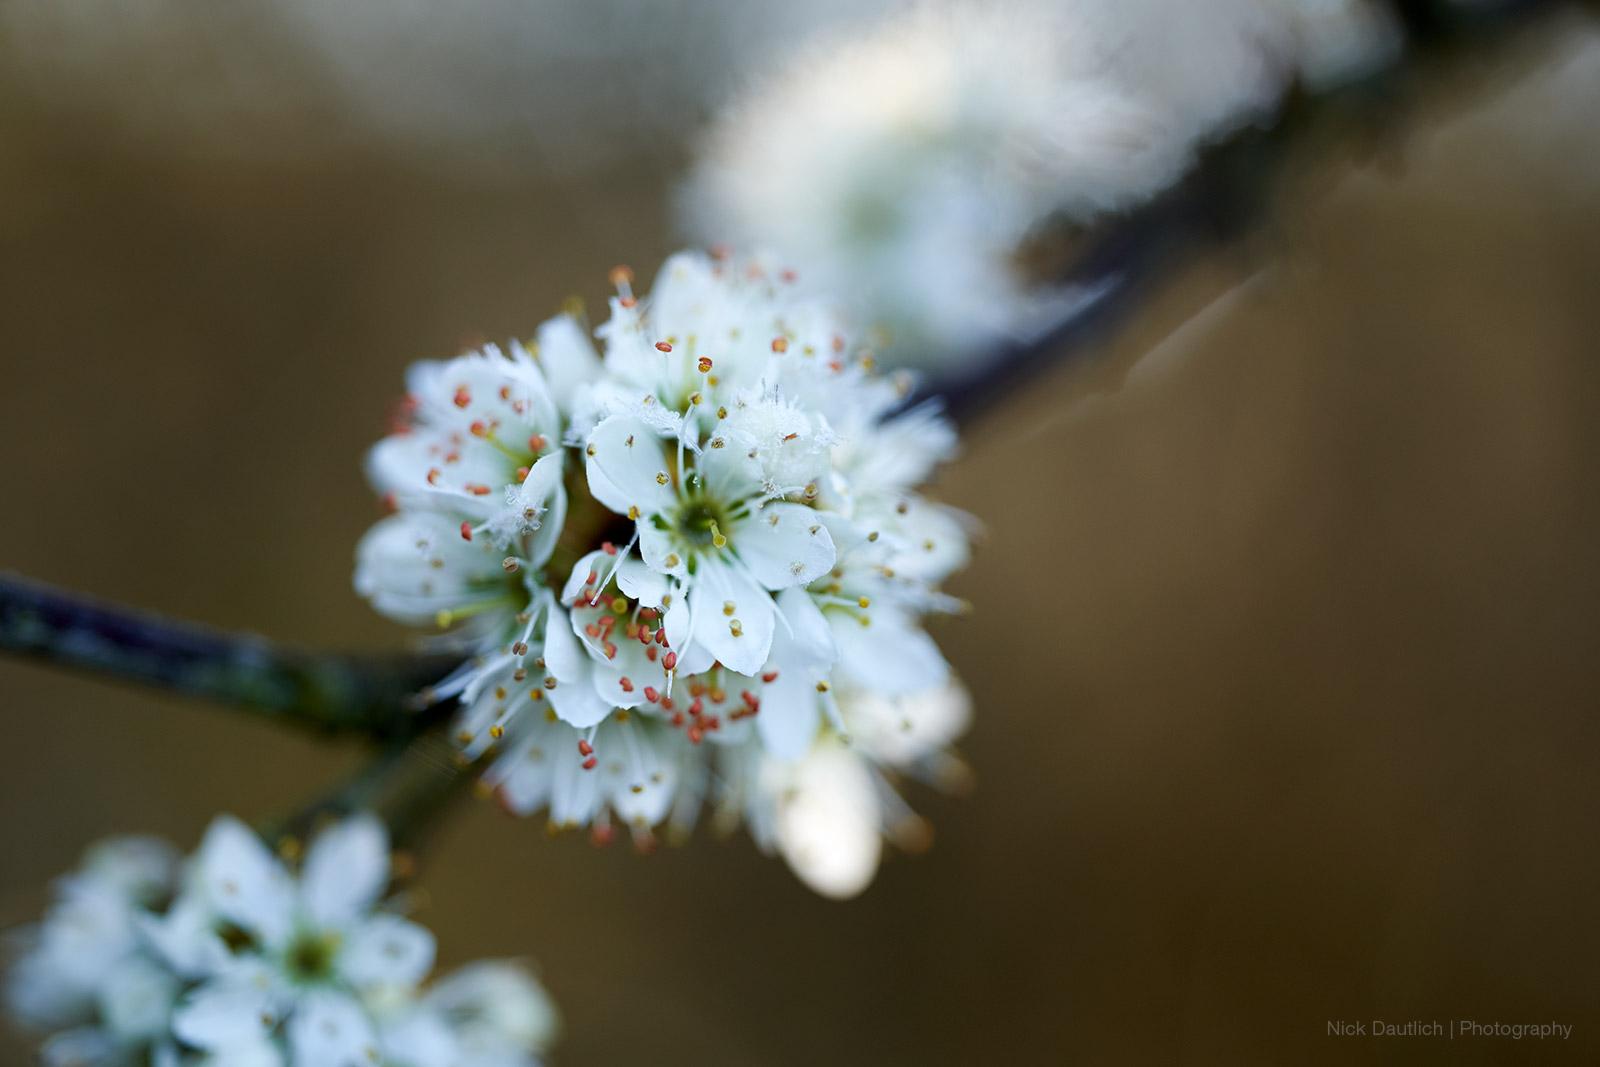 Spring blossoms macro image